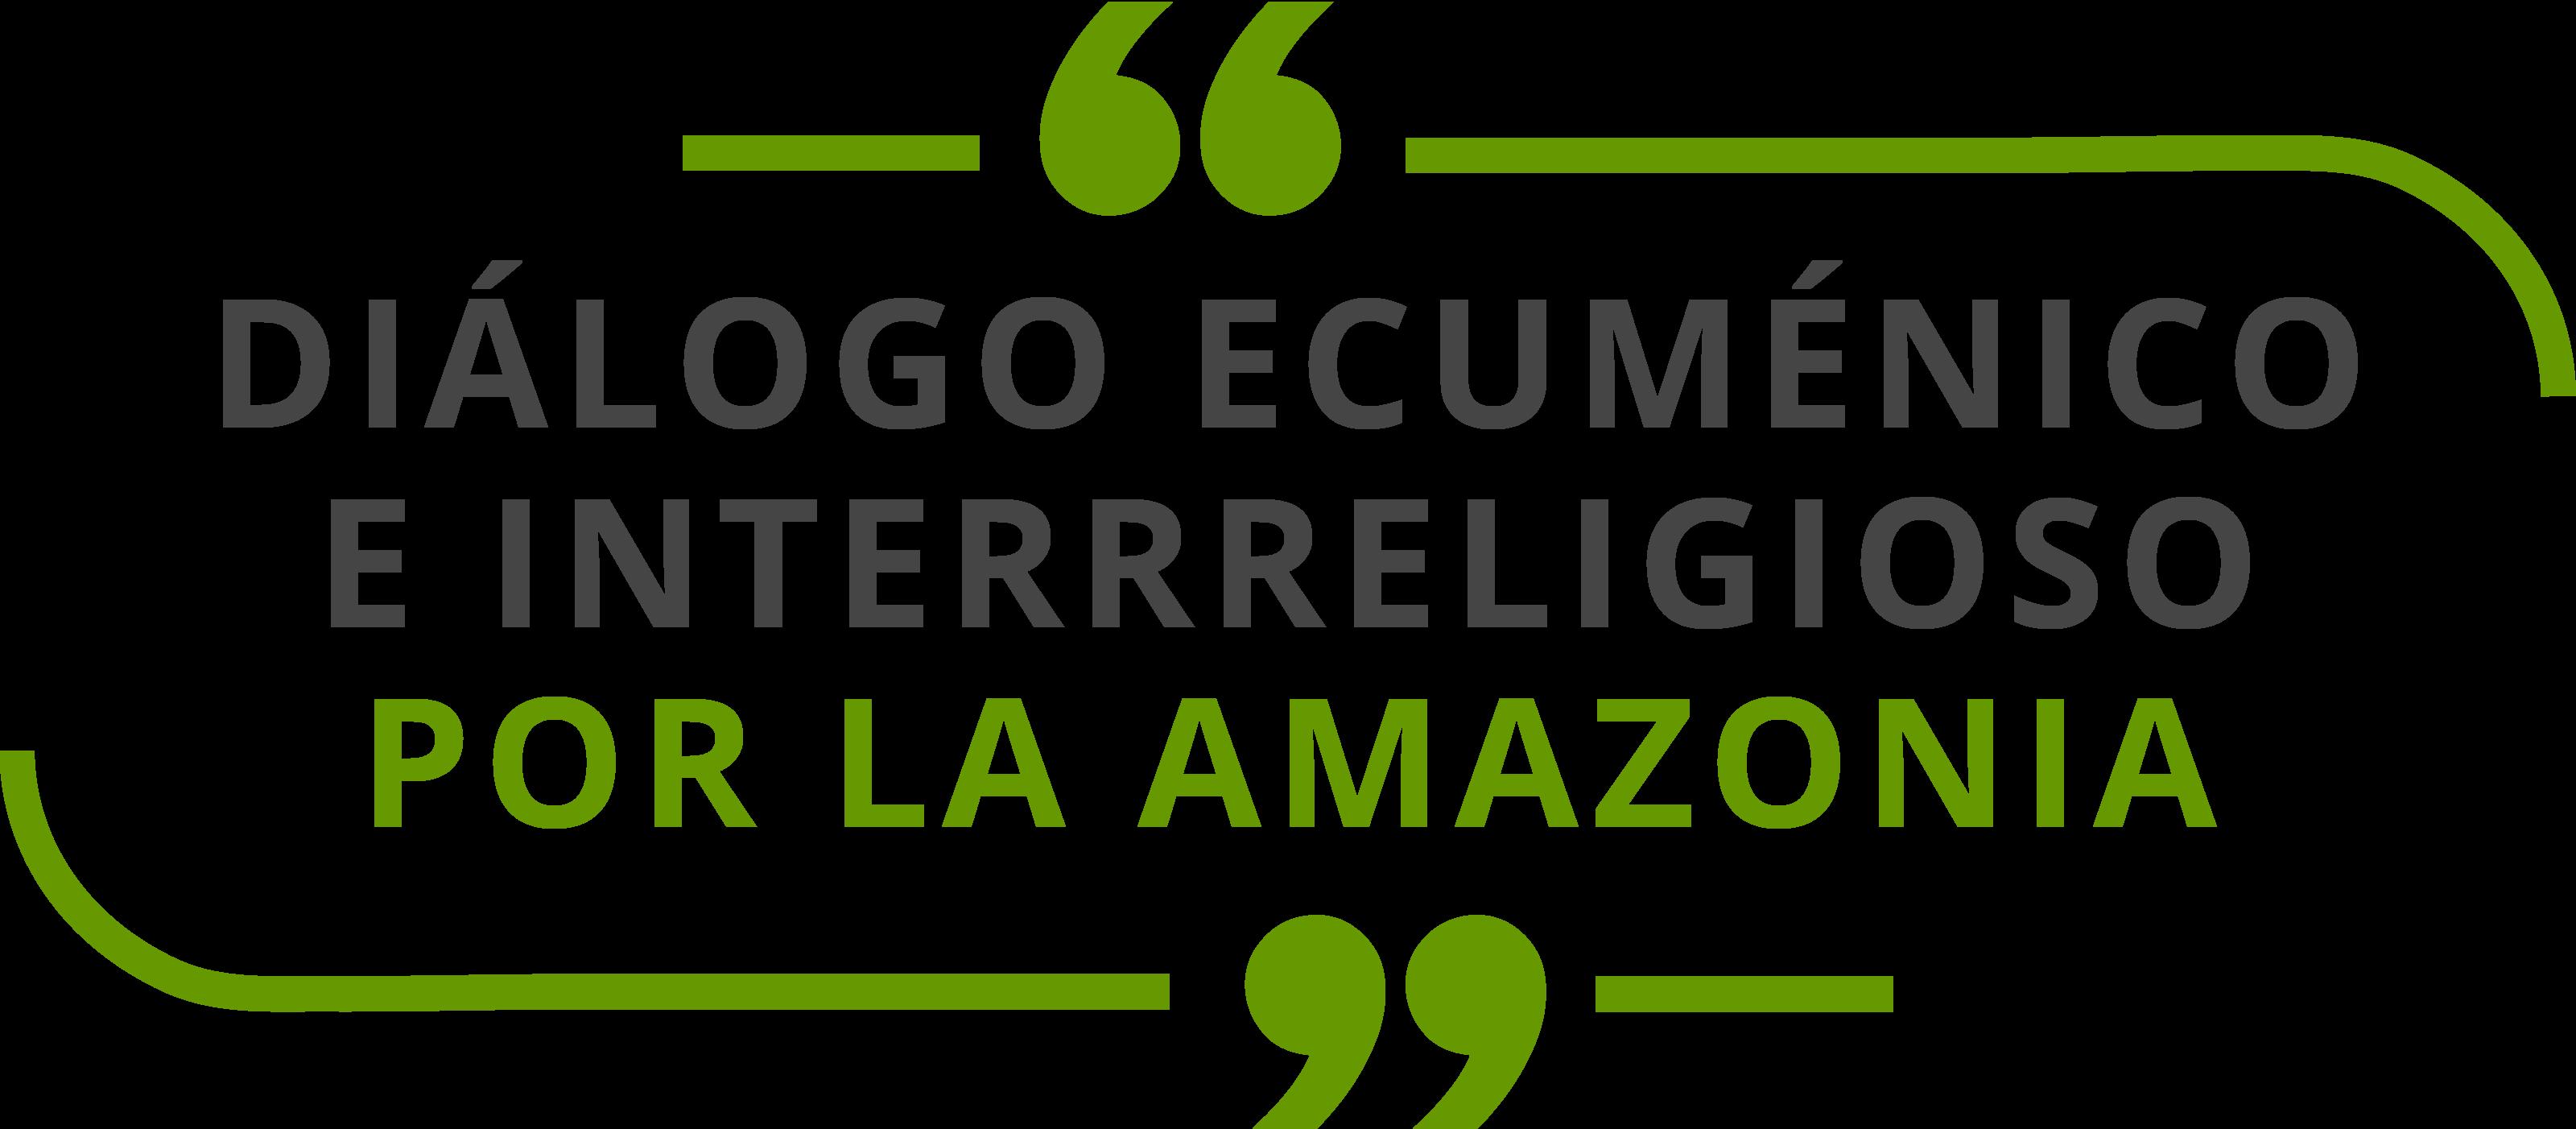 Diálogo Ecuménico e Interreligioso por la Amazonía